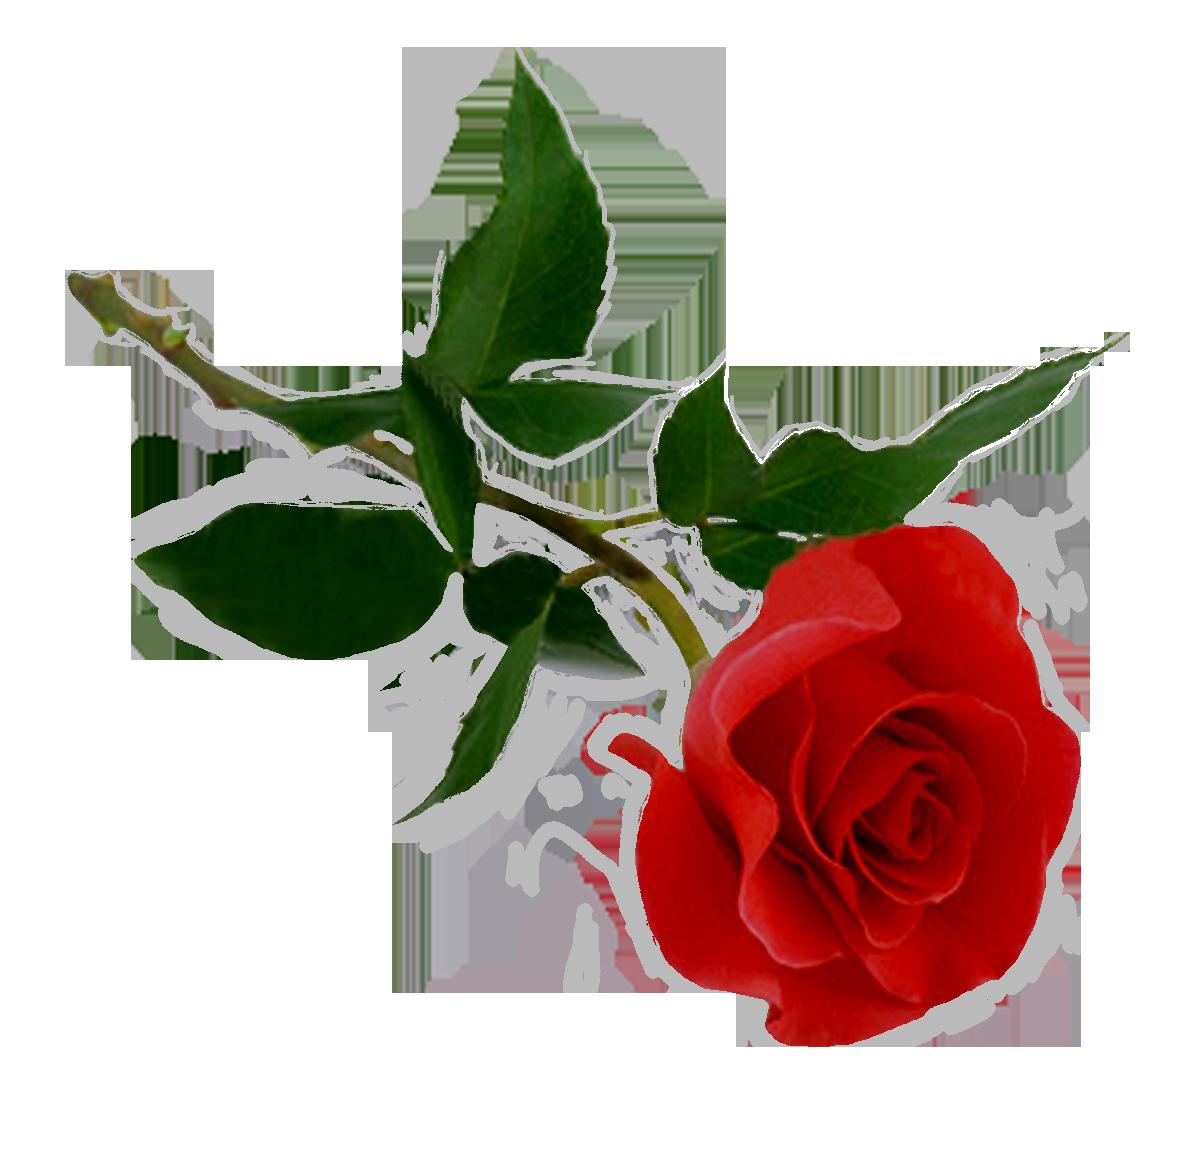 Png Hd Rose Transparent Hd Rose Png Images Pluspng